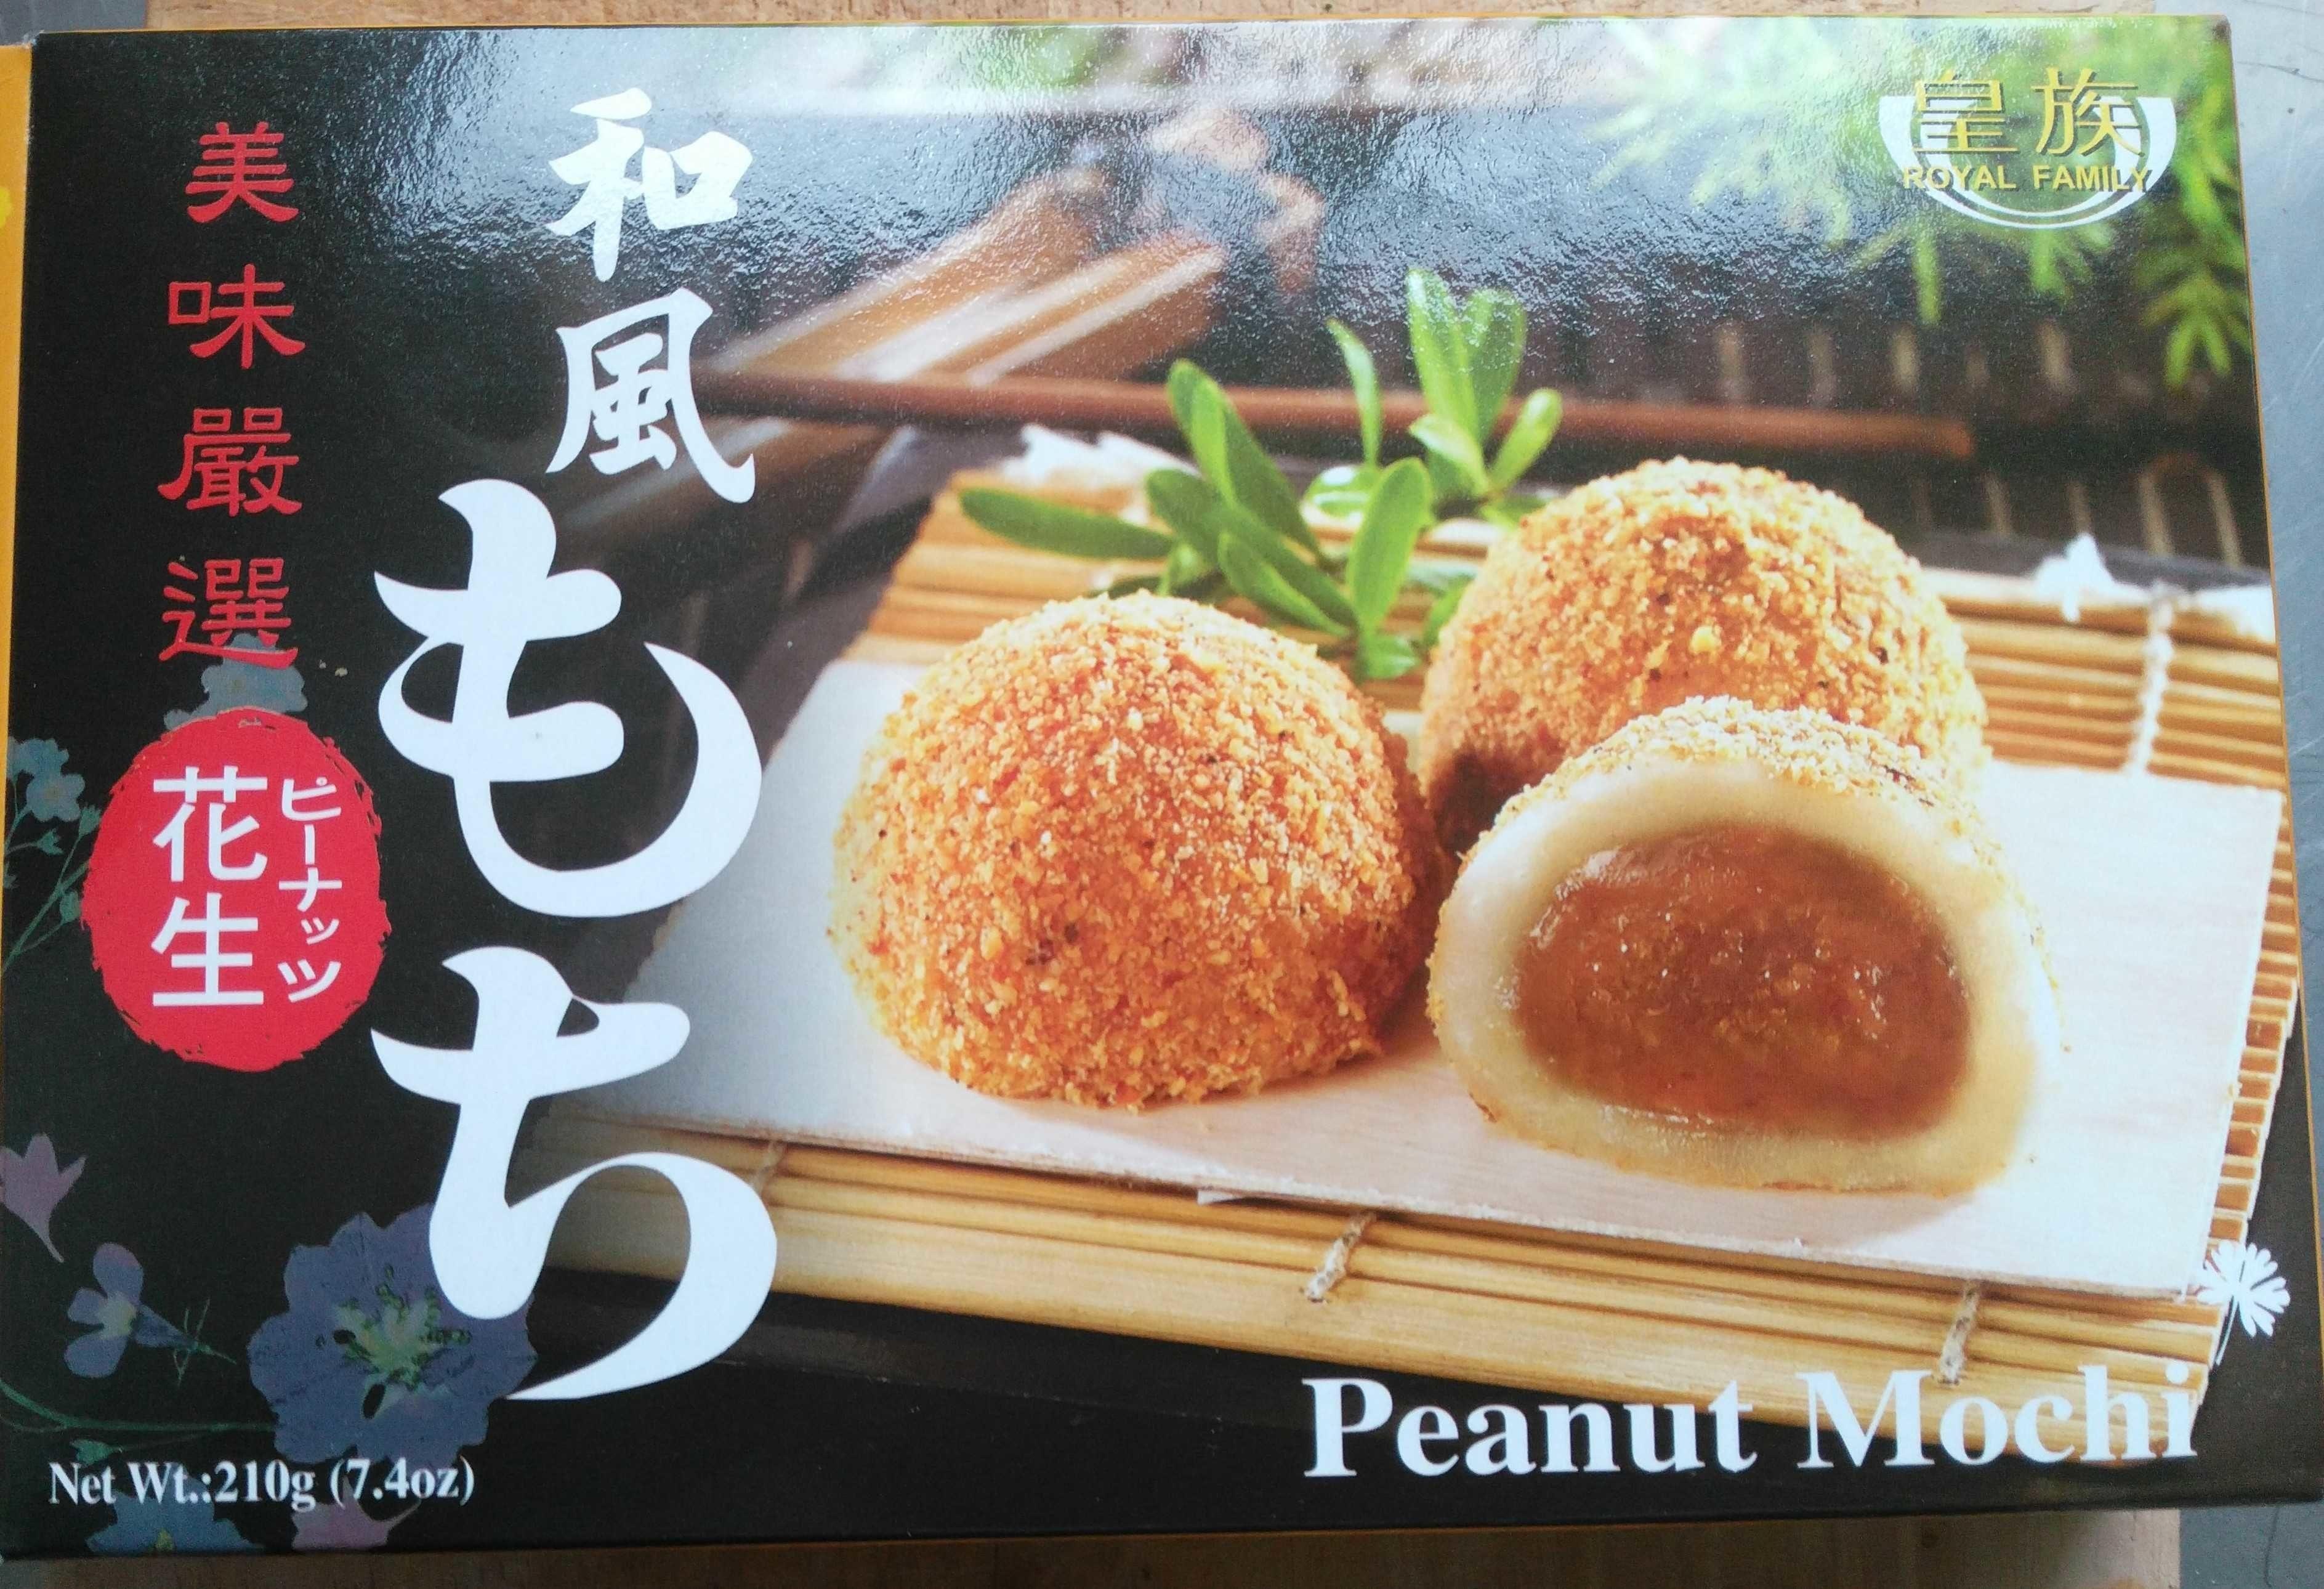 Peanut Mochi - Produit